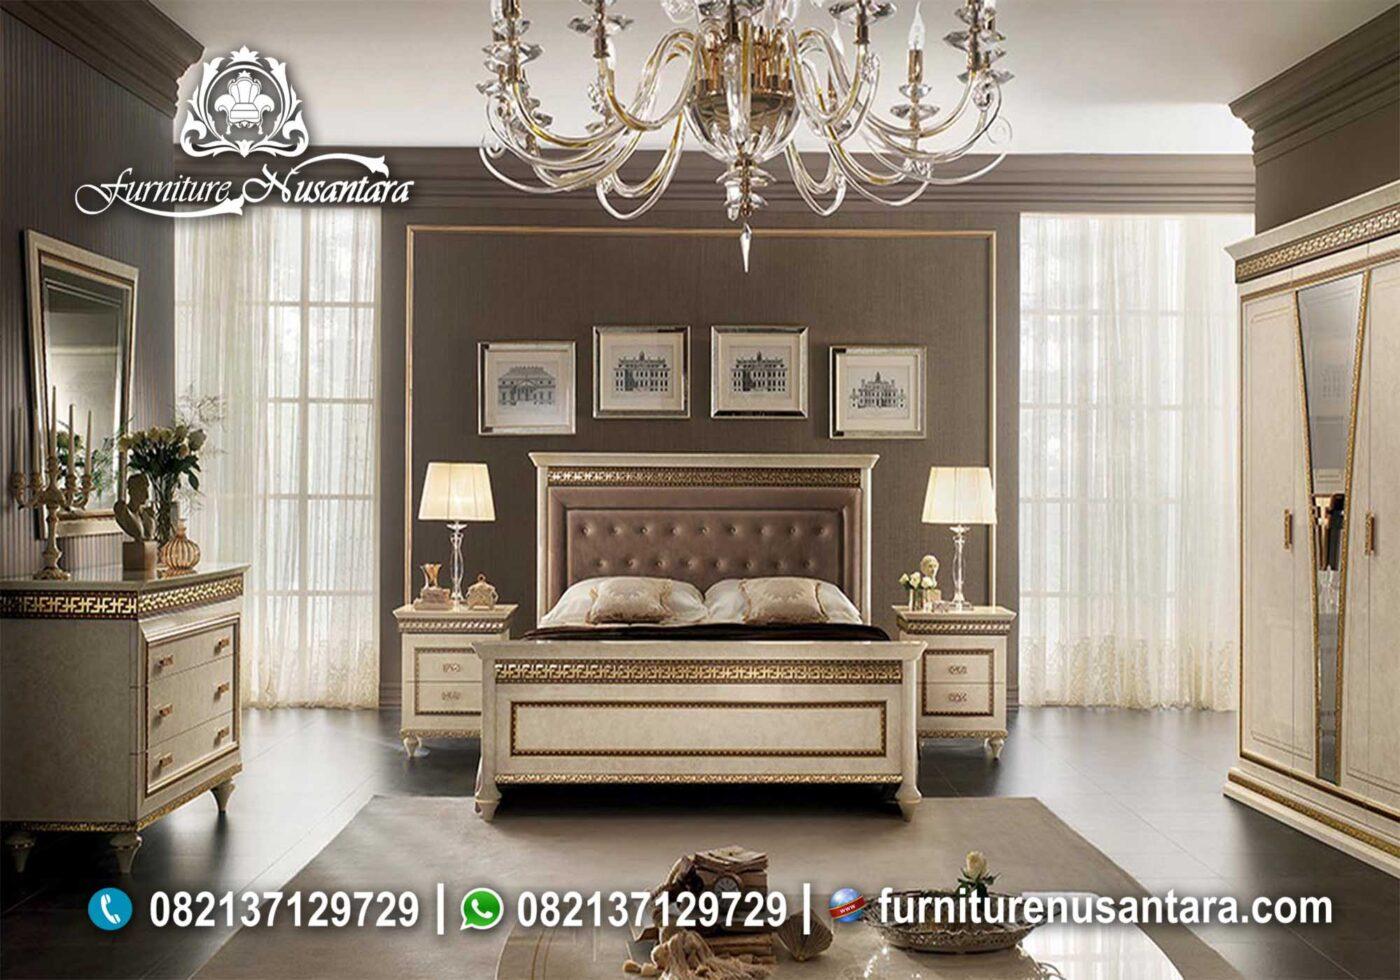 Interior Kamar Set Minimalis KS-77, Furniture Nusantara